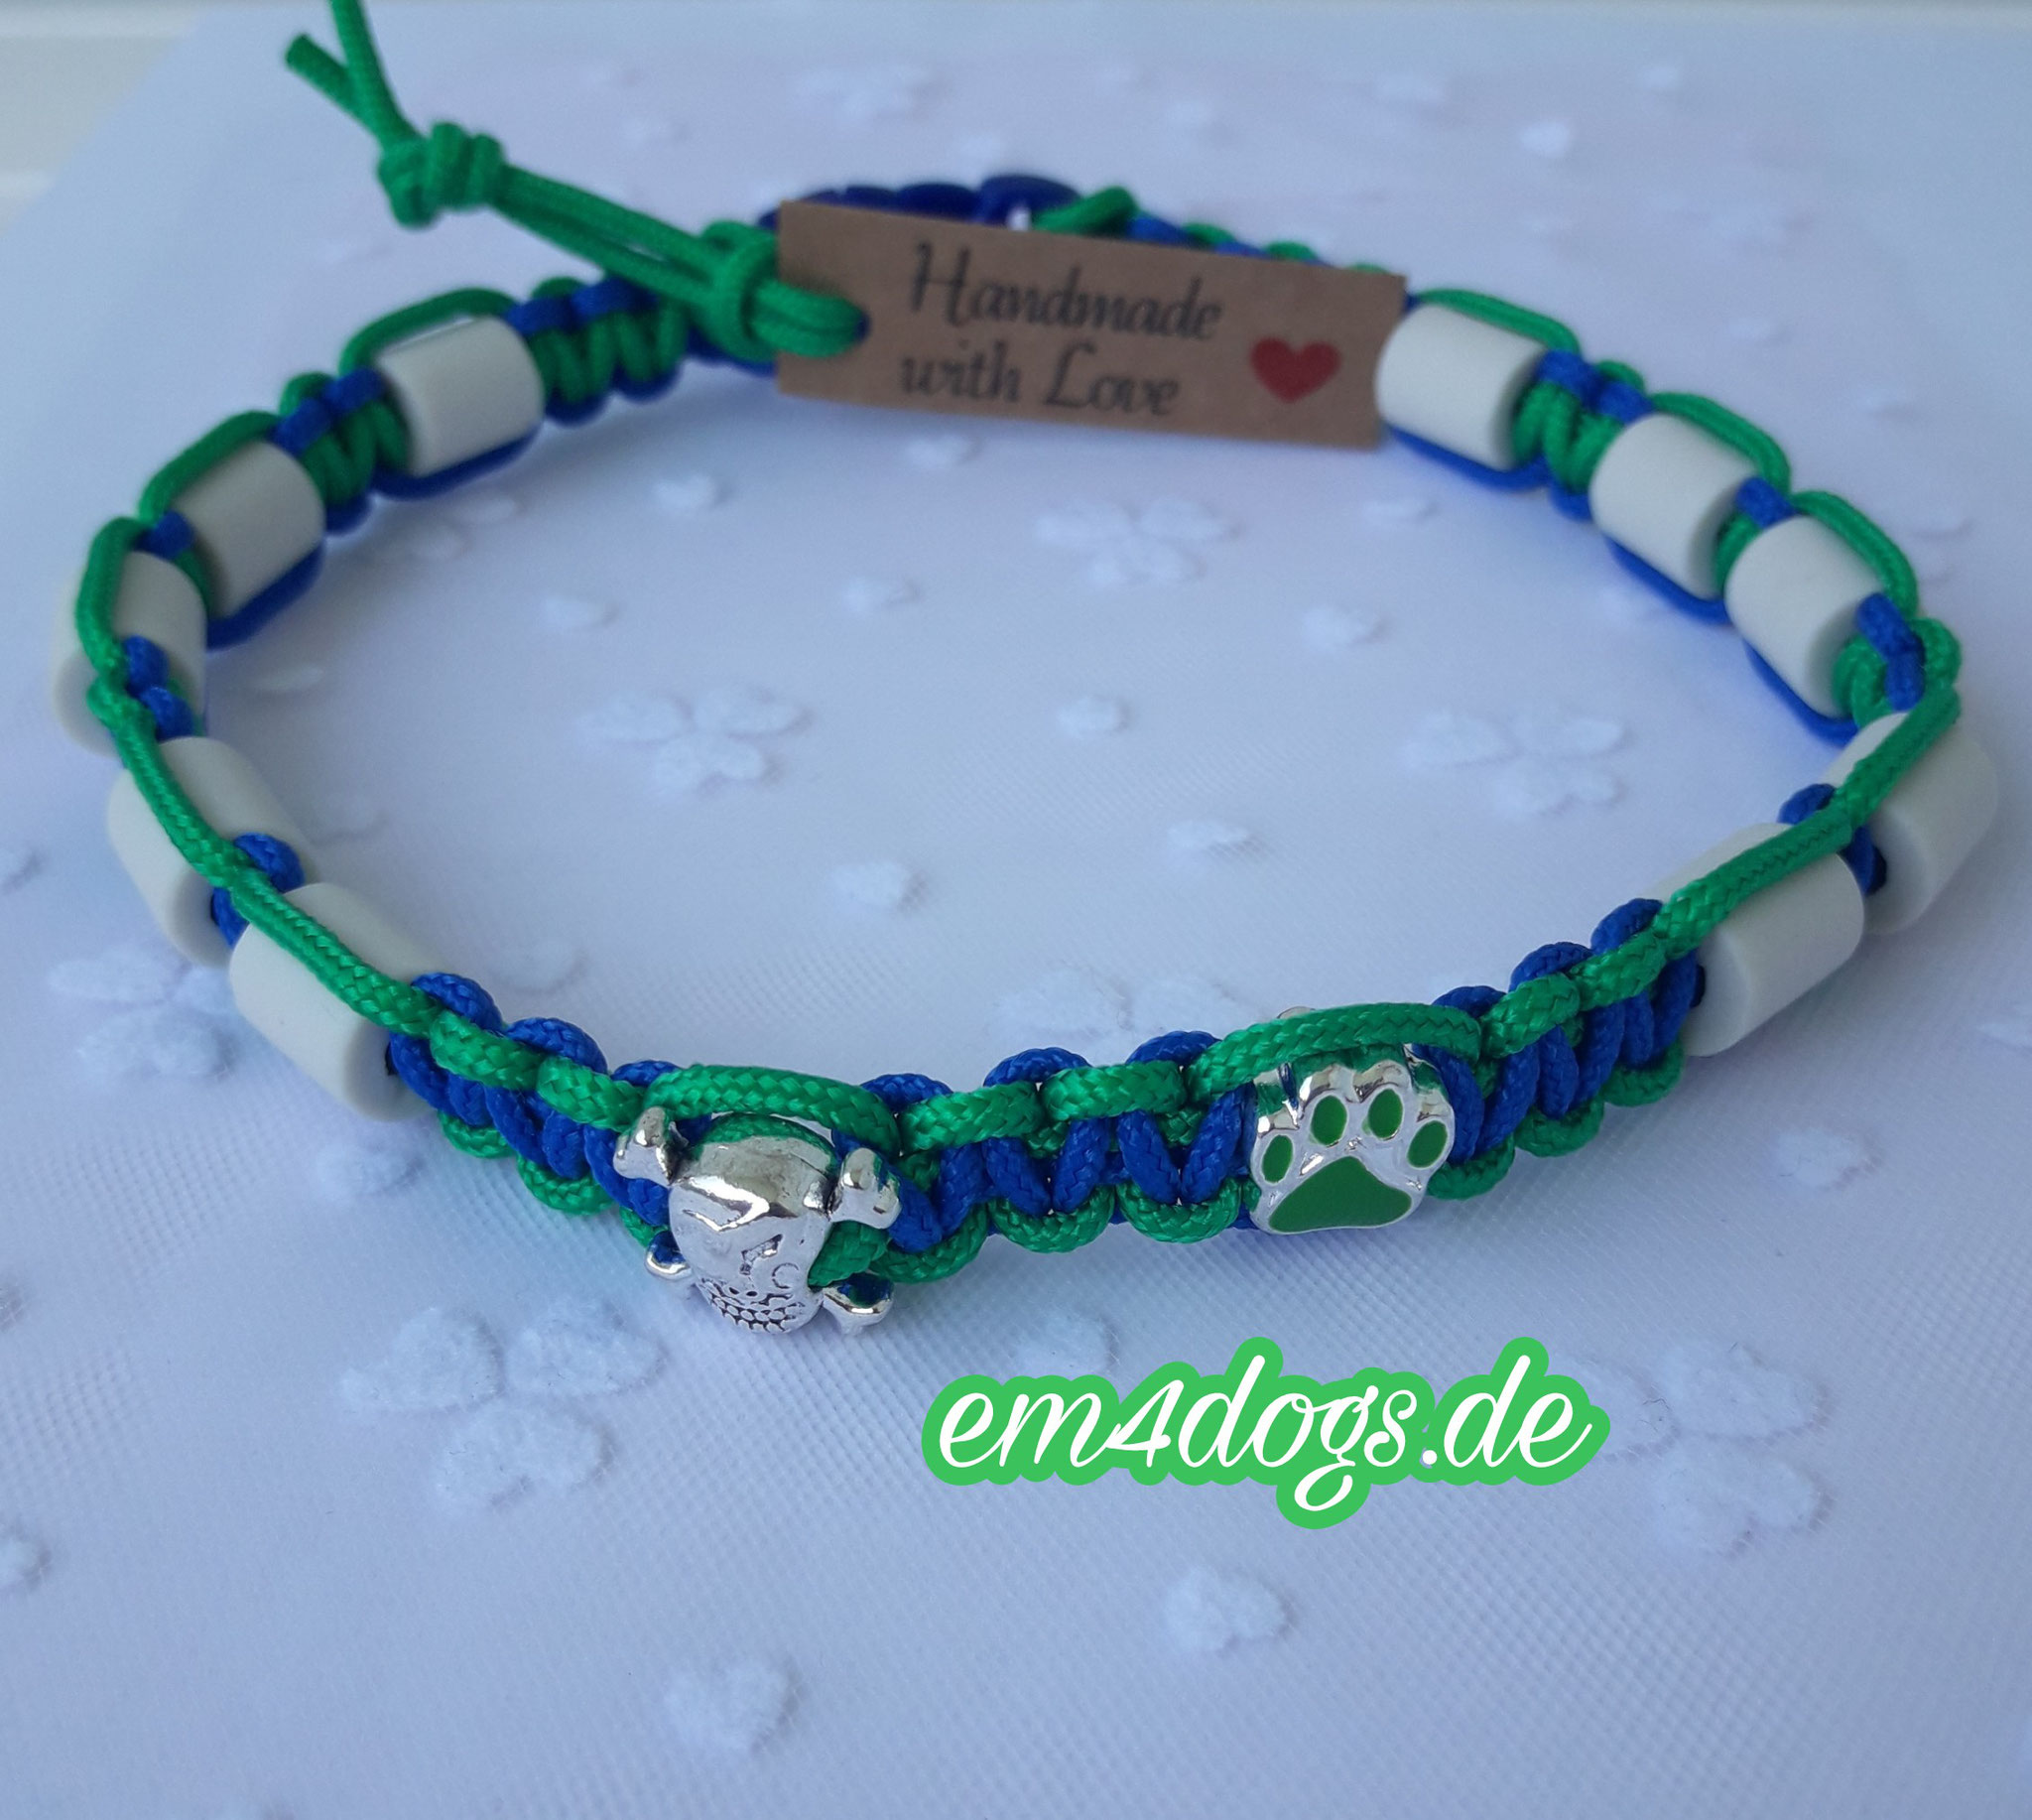 em4dogs.de EM-Keramik Hundehalsband  grün blau